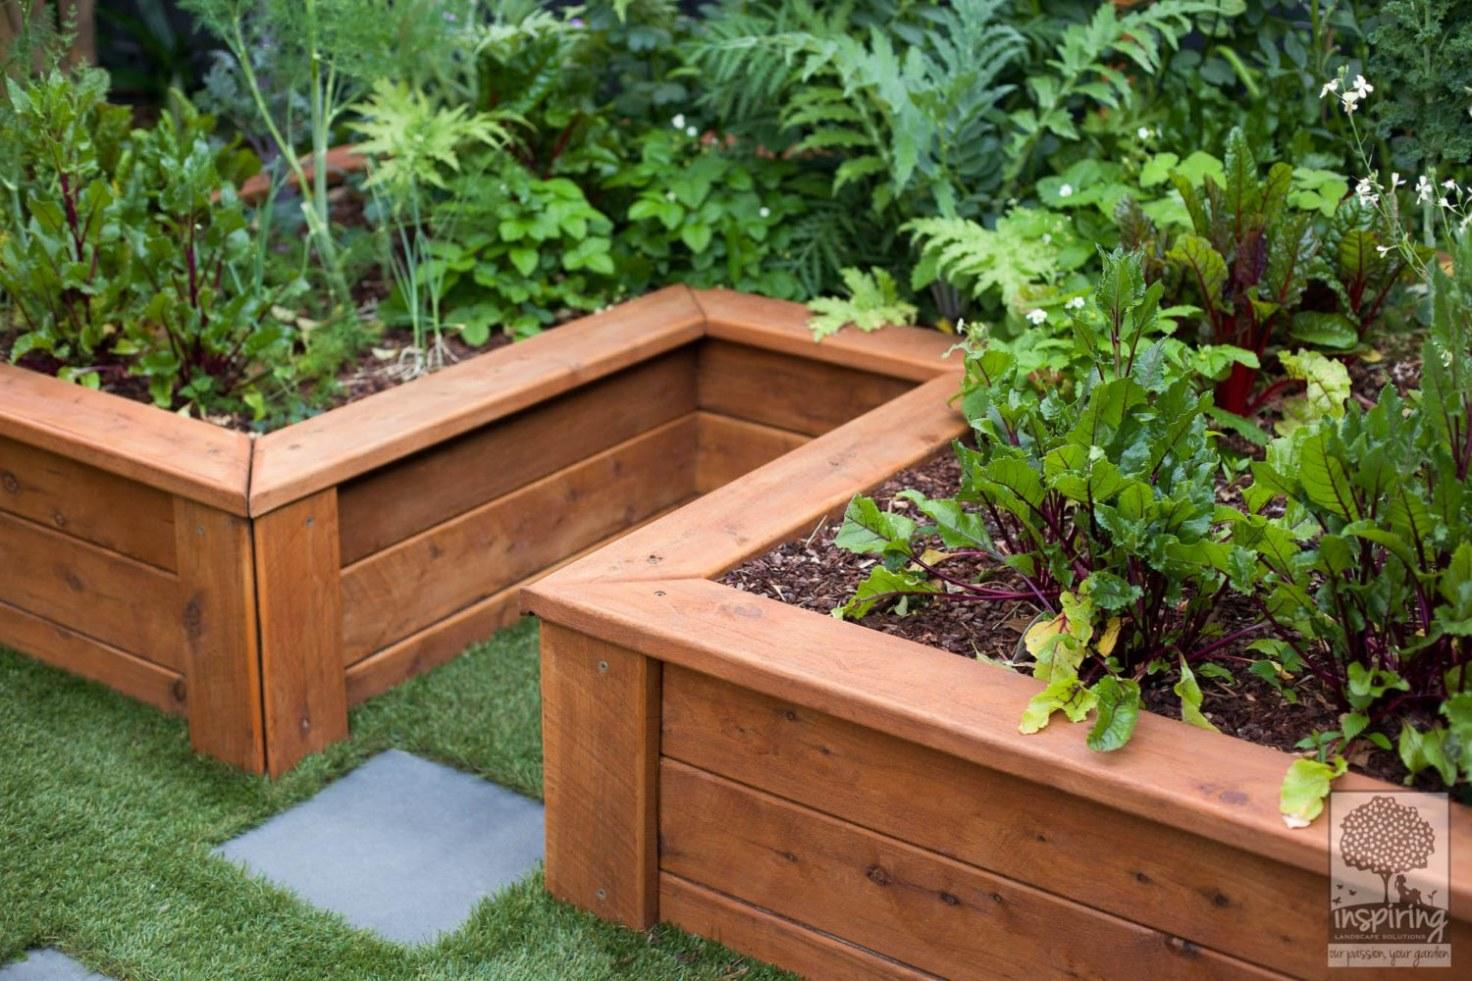 Urban food garden in productive part of Glen Waverley landscape design